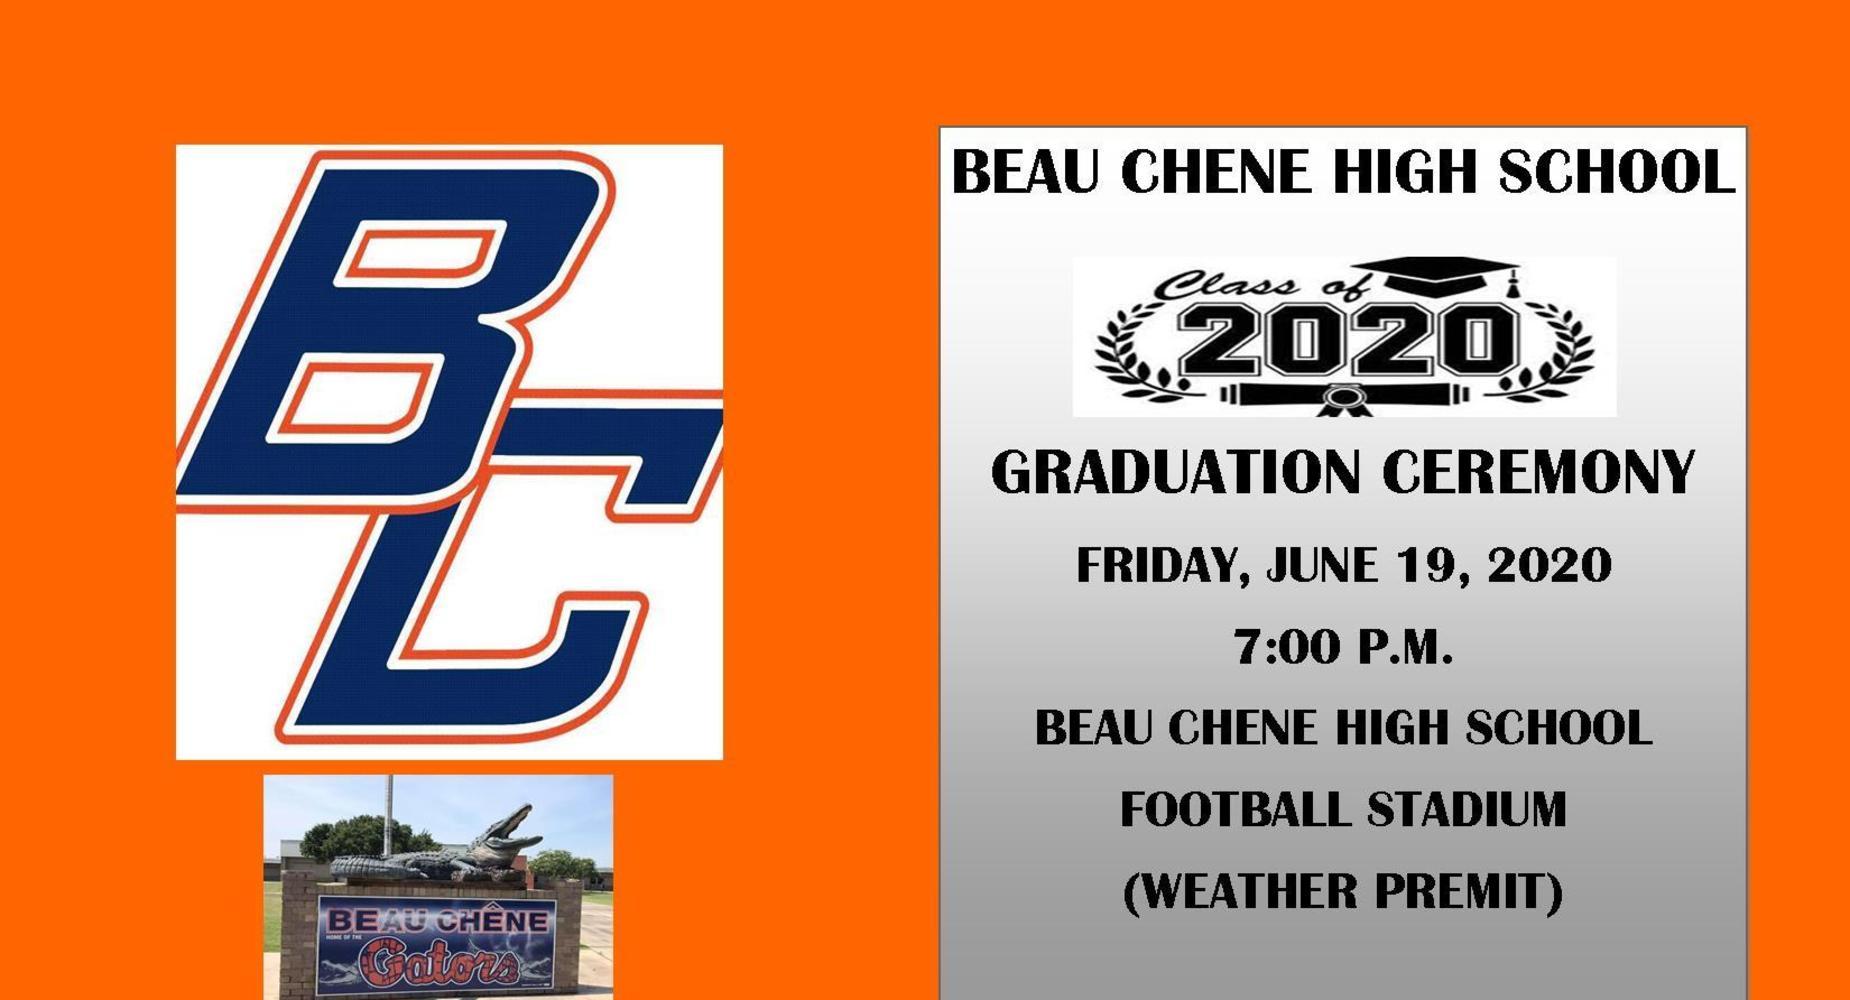 BCHS Graduation Announcement -Class of 2020 - Football Stadium - June 19,2020 (weather permits)